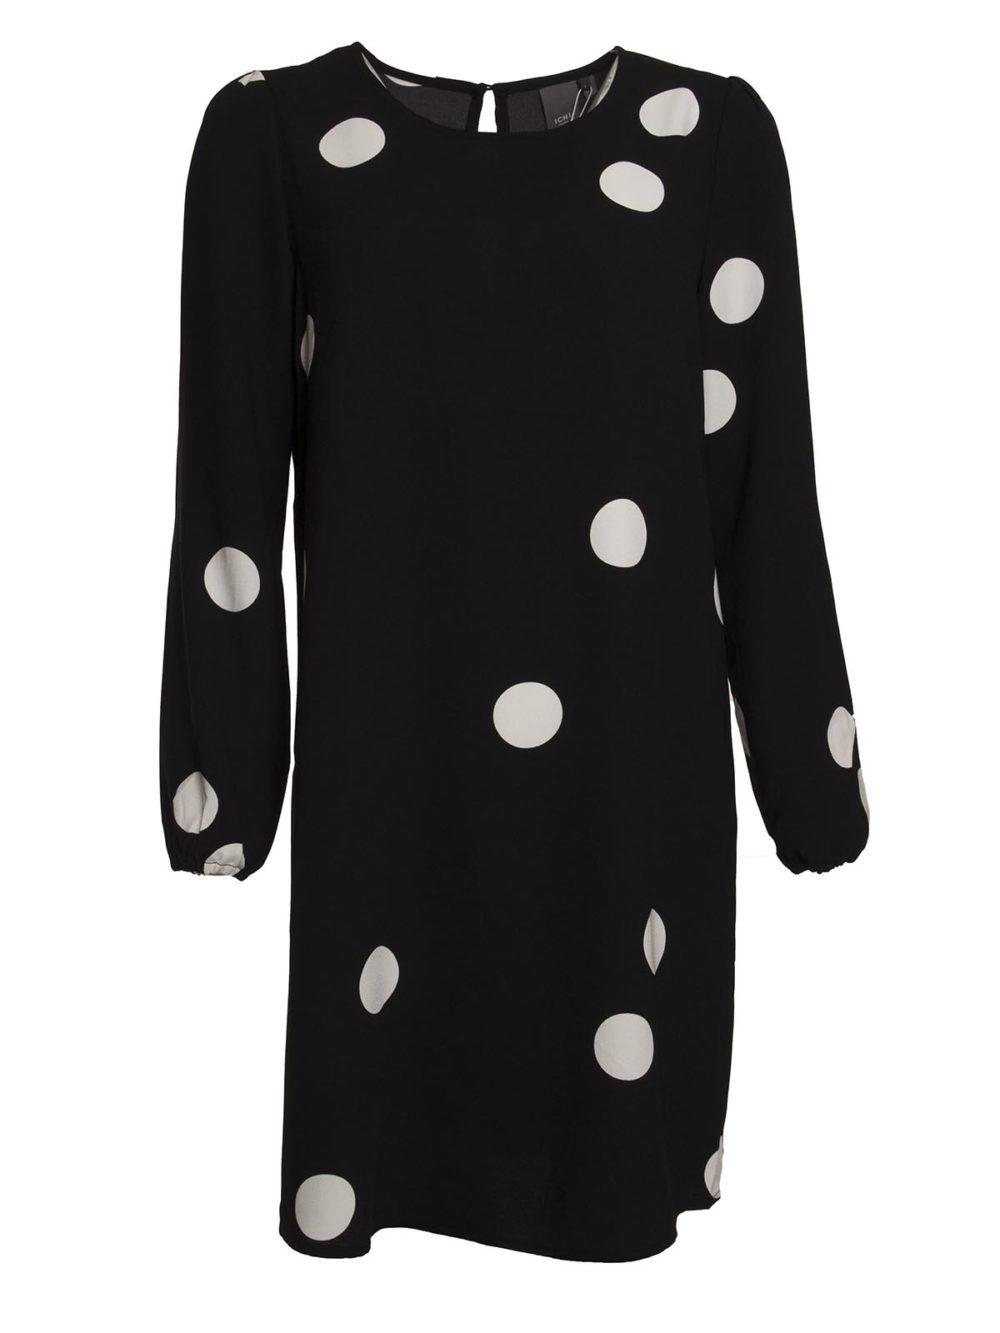 Bobby Dress ICHI Katie Kerr Women's clothing